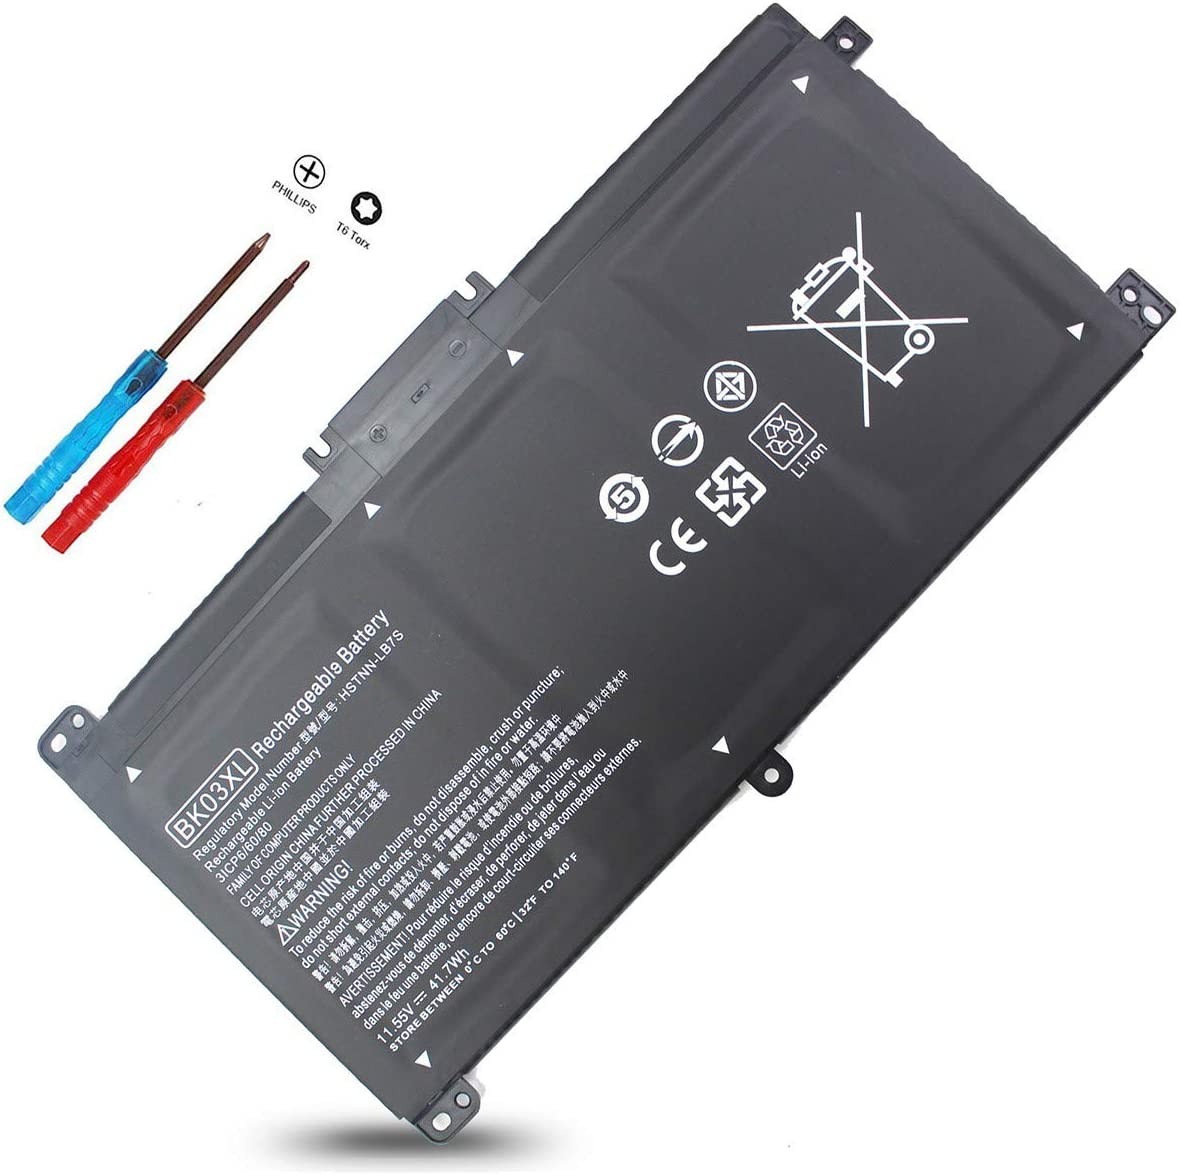 BK03XL Battery for HP Pavilion X360 14m-ba011dx 14m-ba013dx 14m-ba015dx 14m-ba114dx 14-ba253cl 14-ba125cl 14-ba175nr 14-ba051cl 916366-421 916811-855 916366-541 HSTNN-LB7S HSTNN-UB7G 916812-855 14 14M